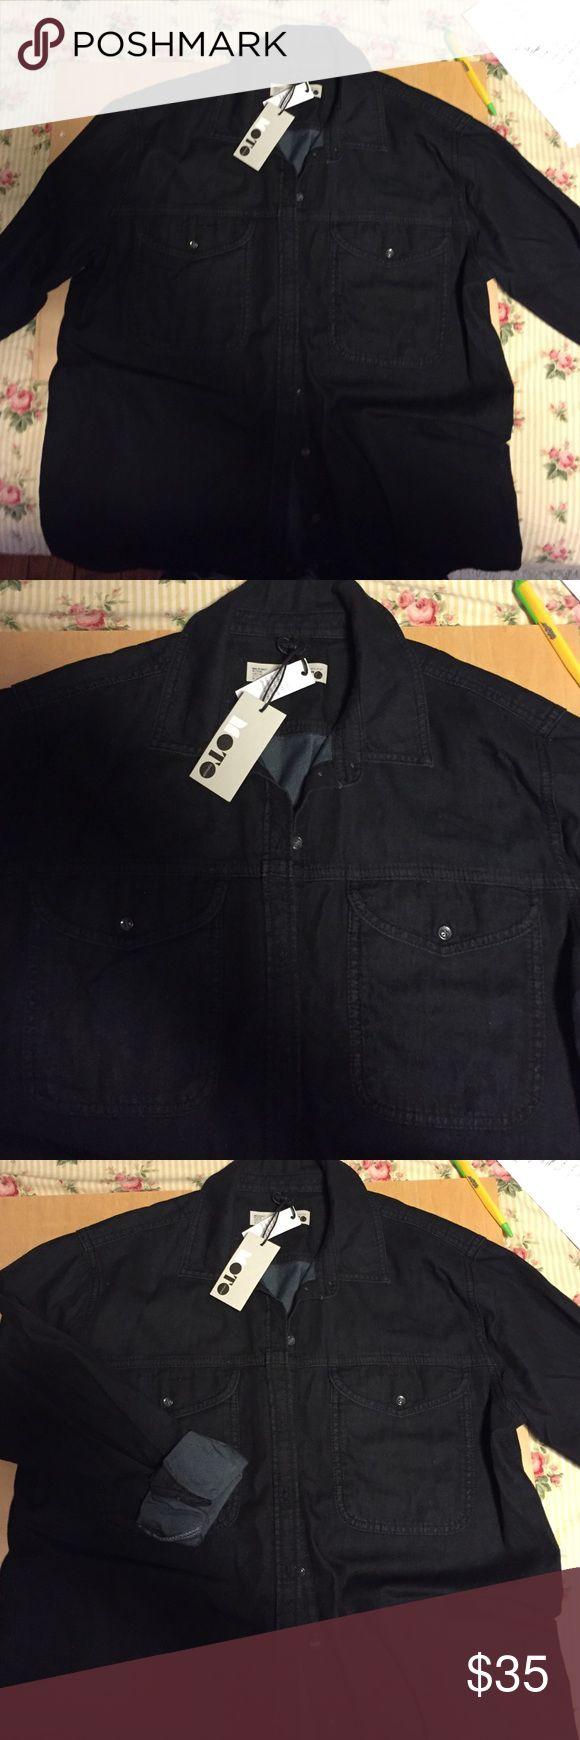 Ladies denim shirt Top shop Black denim shirt button up Topshop Tops Button Down Shirts